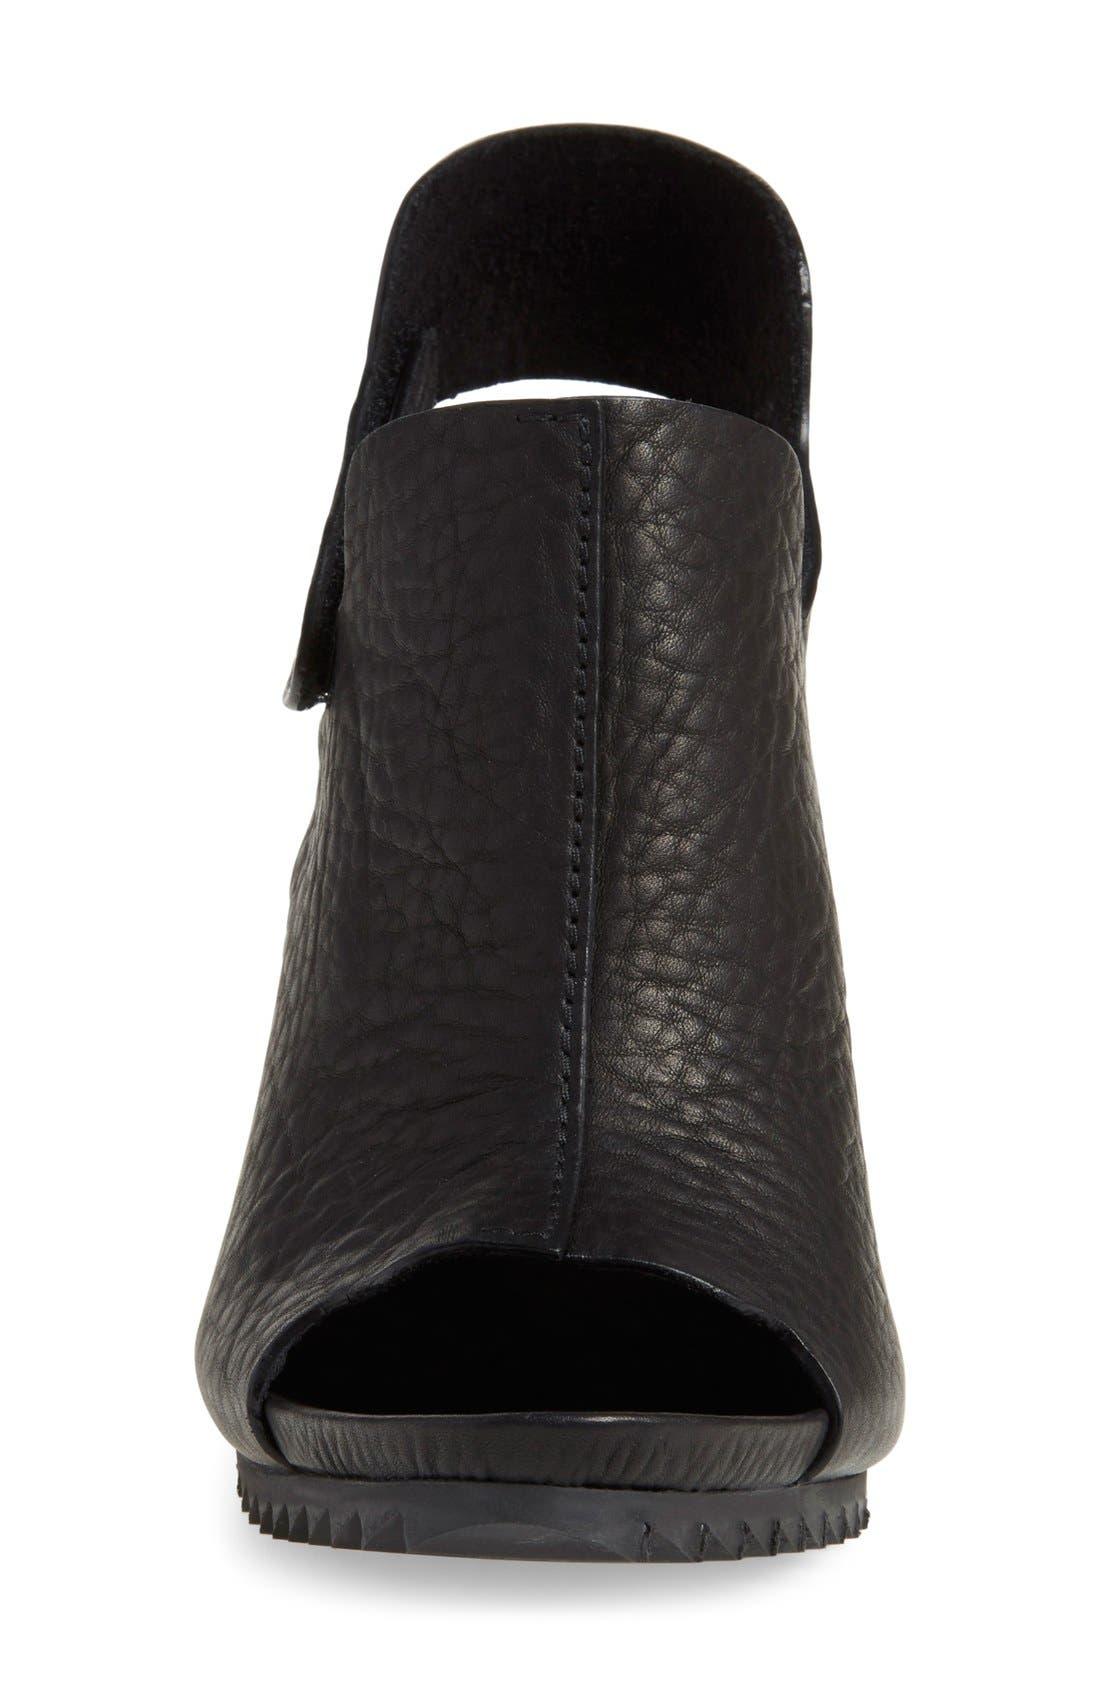 Alternate Image 3  - Pedro Garcia 'Yareli' Slingback Sandal (Women)